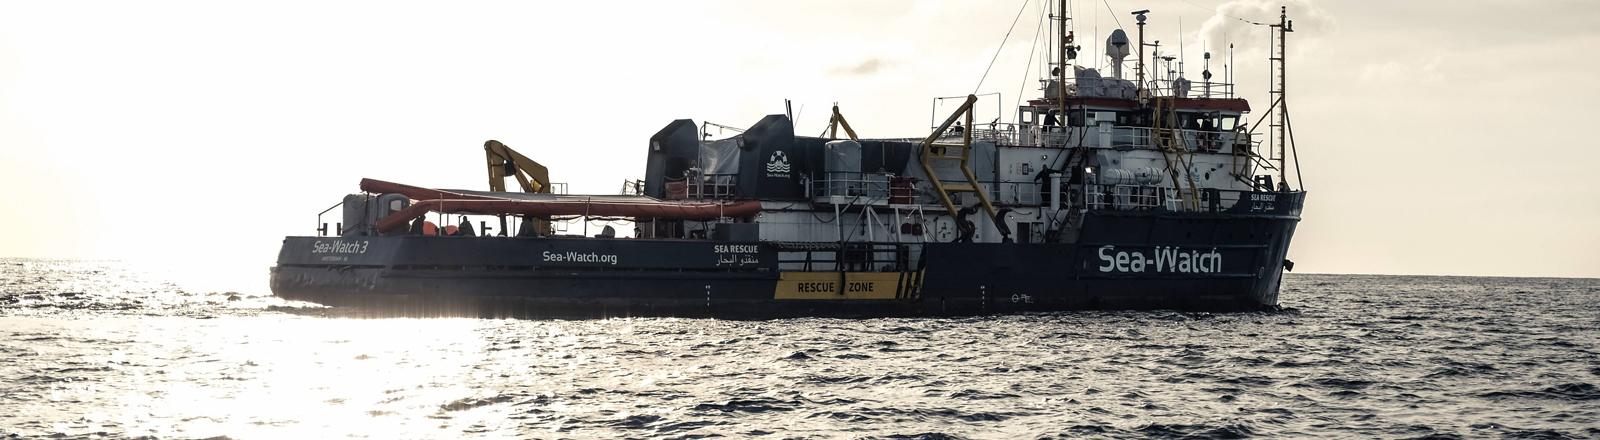 Schiff auf offenem Meer